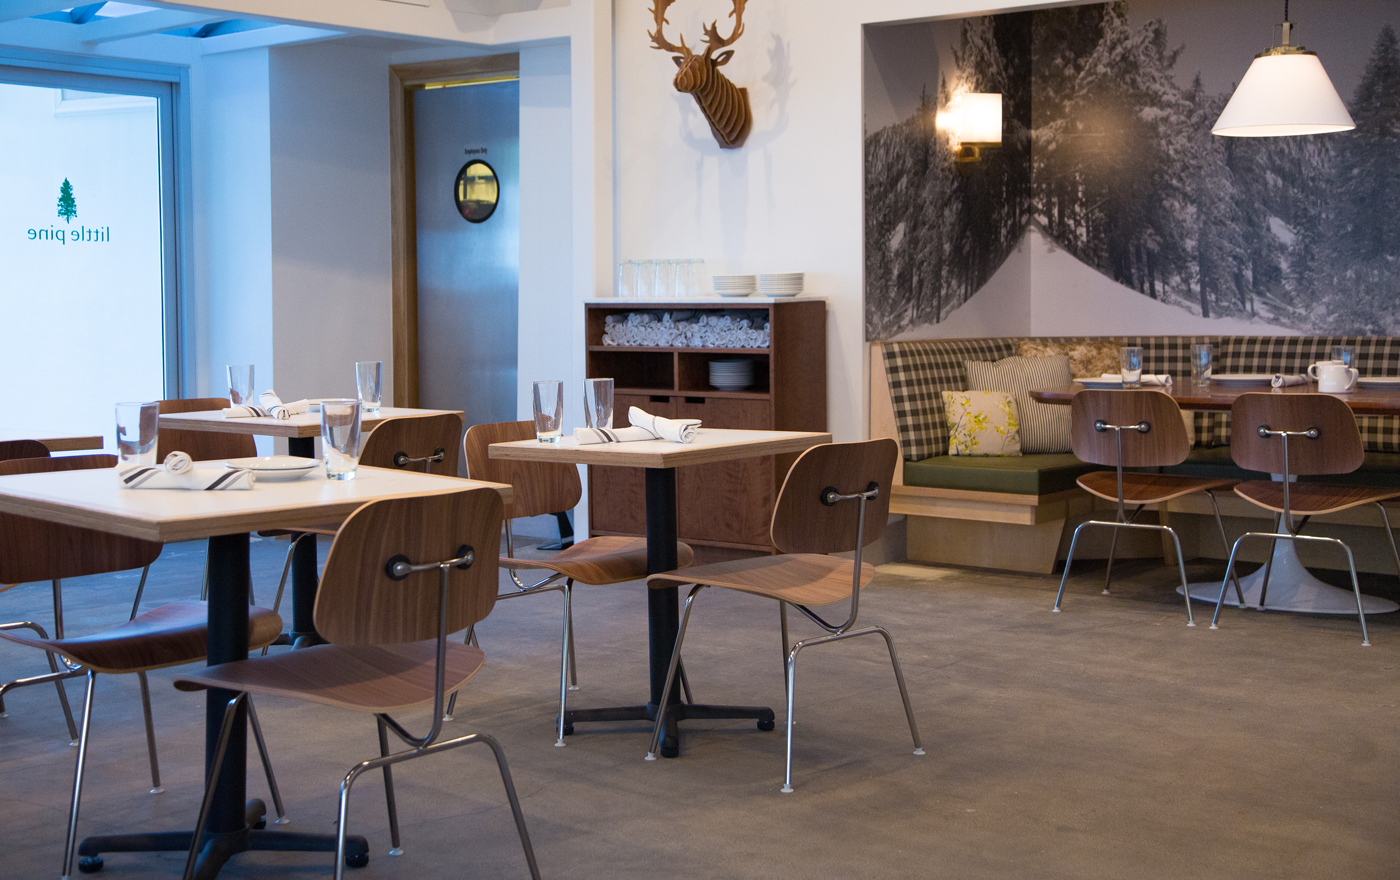 moby-little-pine-restaurant-354A5415